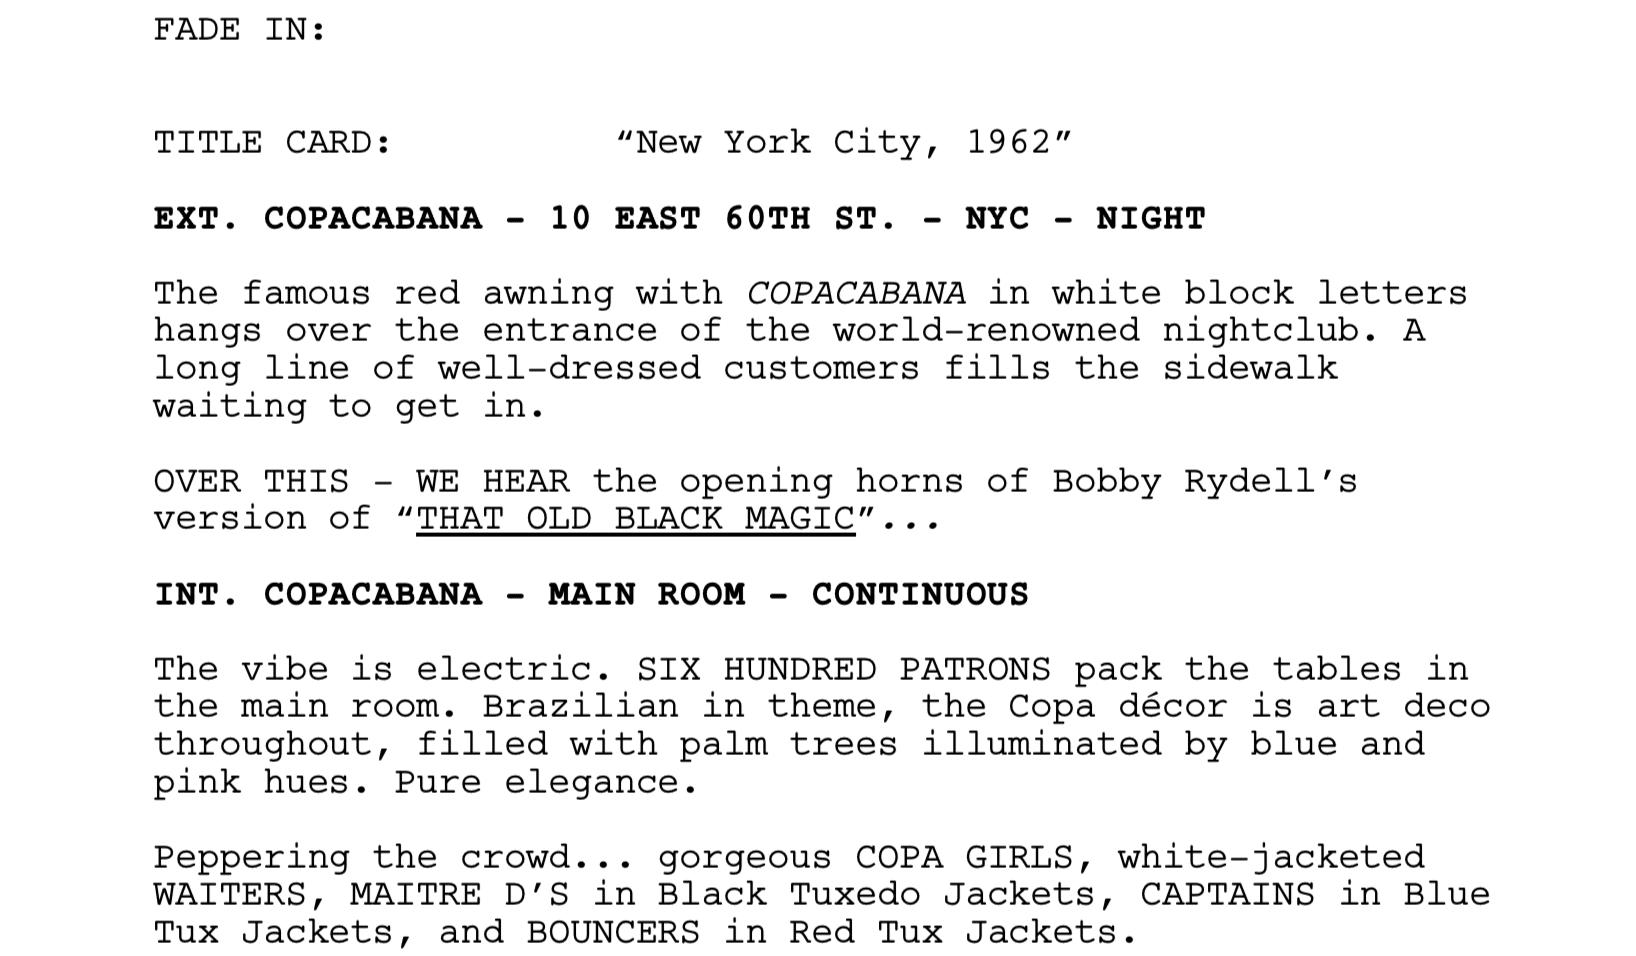 best original screenplay